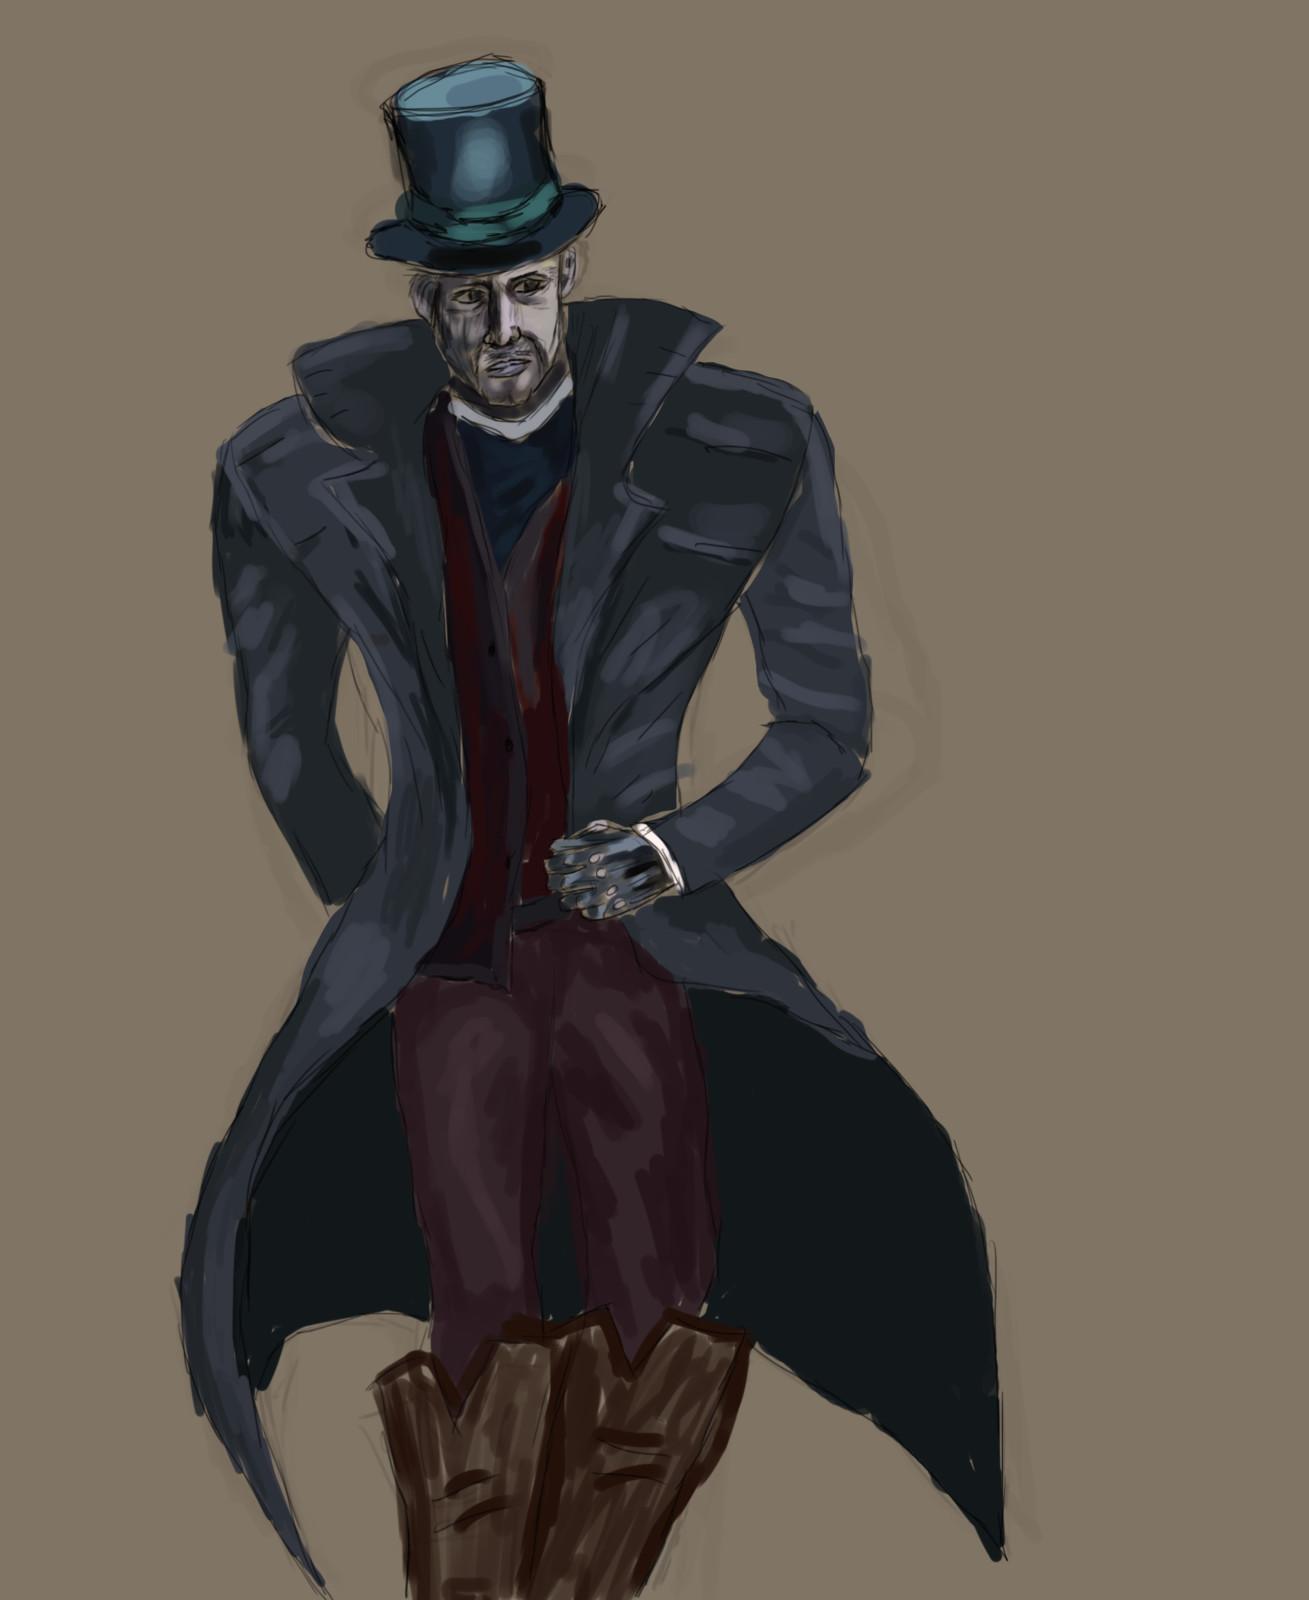 Concept Art for a Victorian Villain character